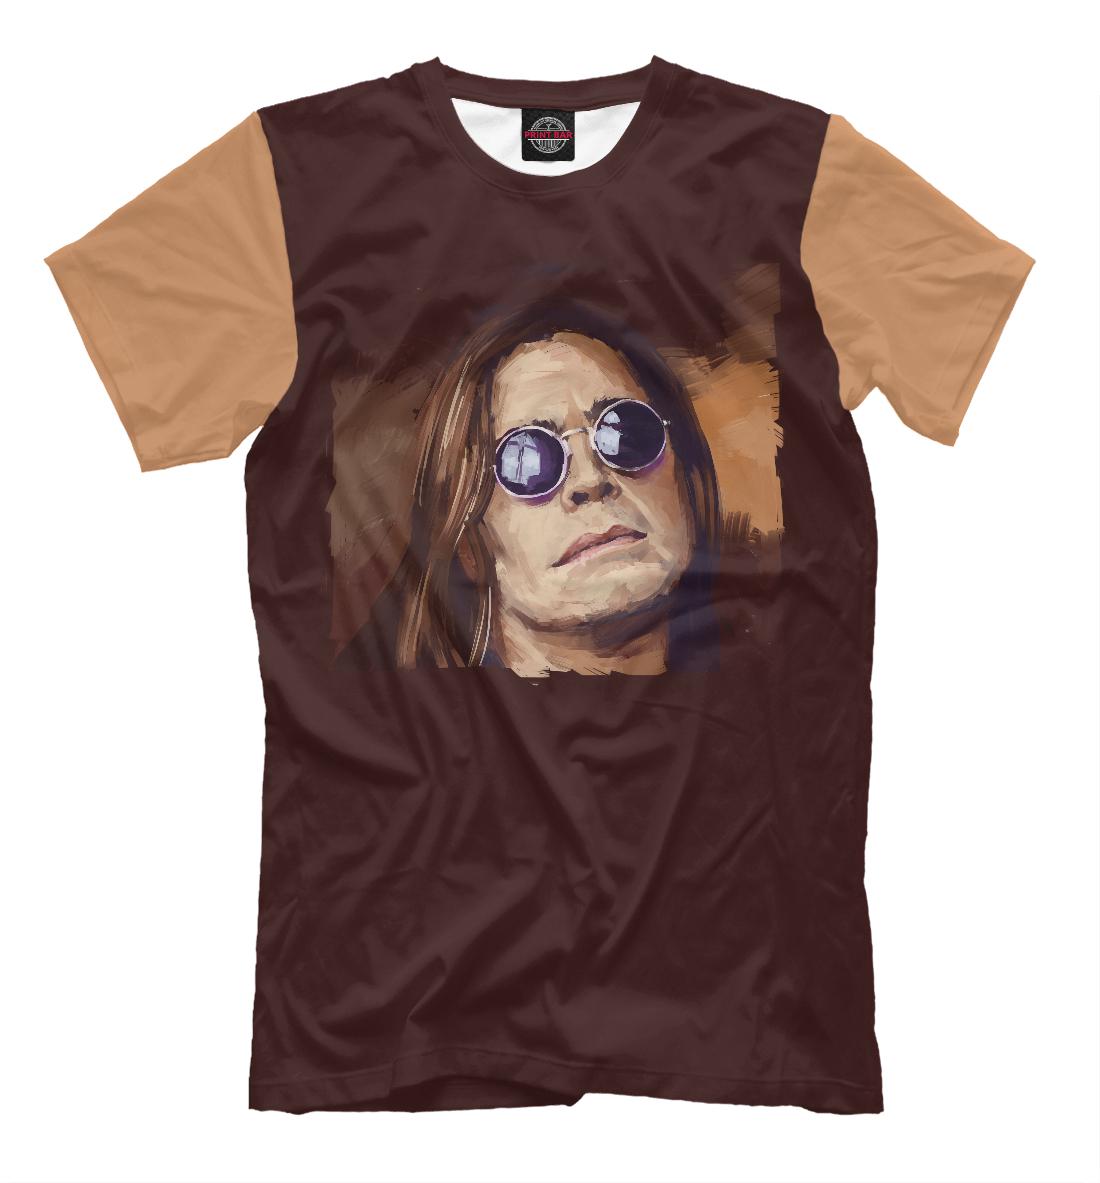 Купить Ozzy Osbourne, Printbar, Футболки, OZO-770528-fut-2